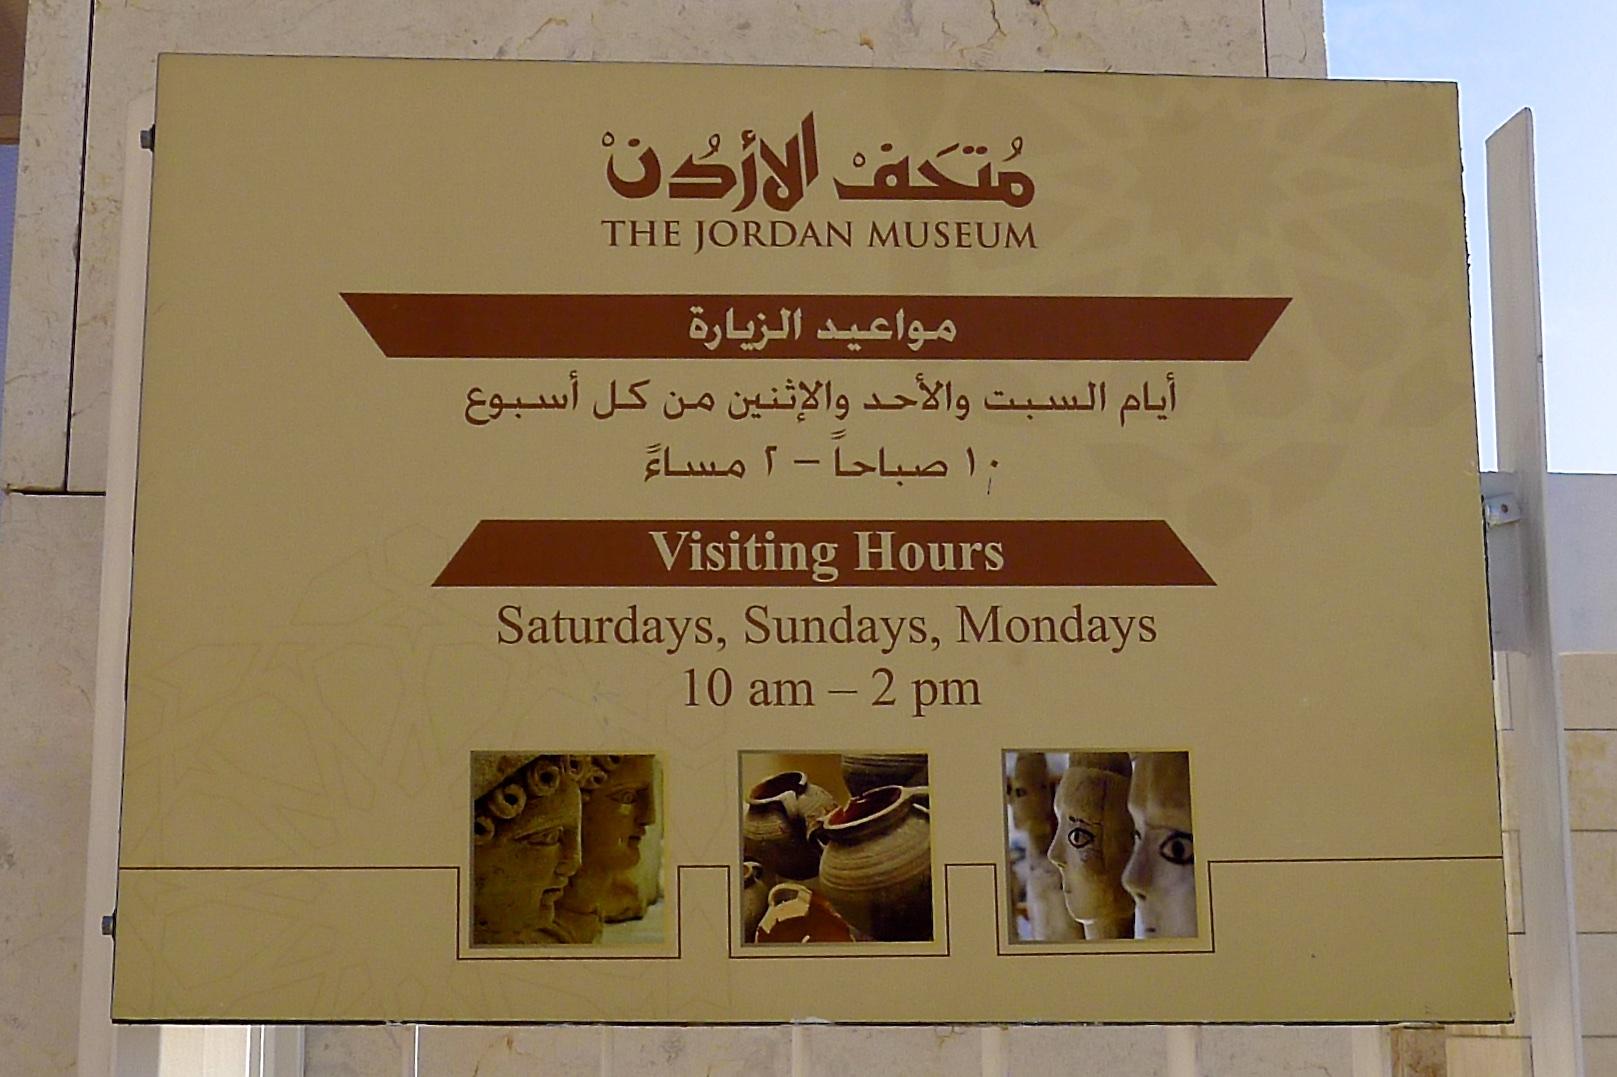 jordanmuseum 5.jpg